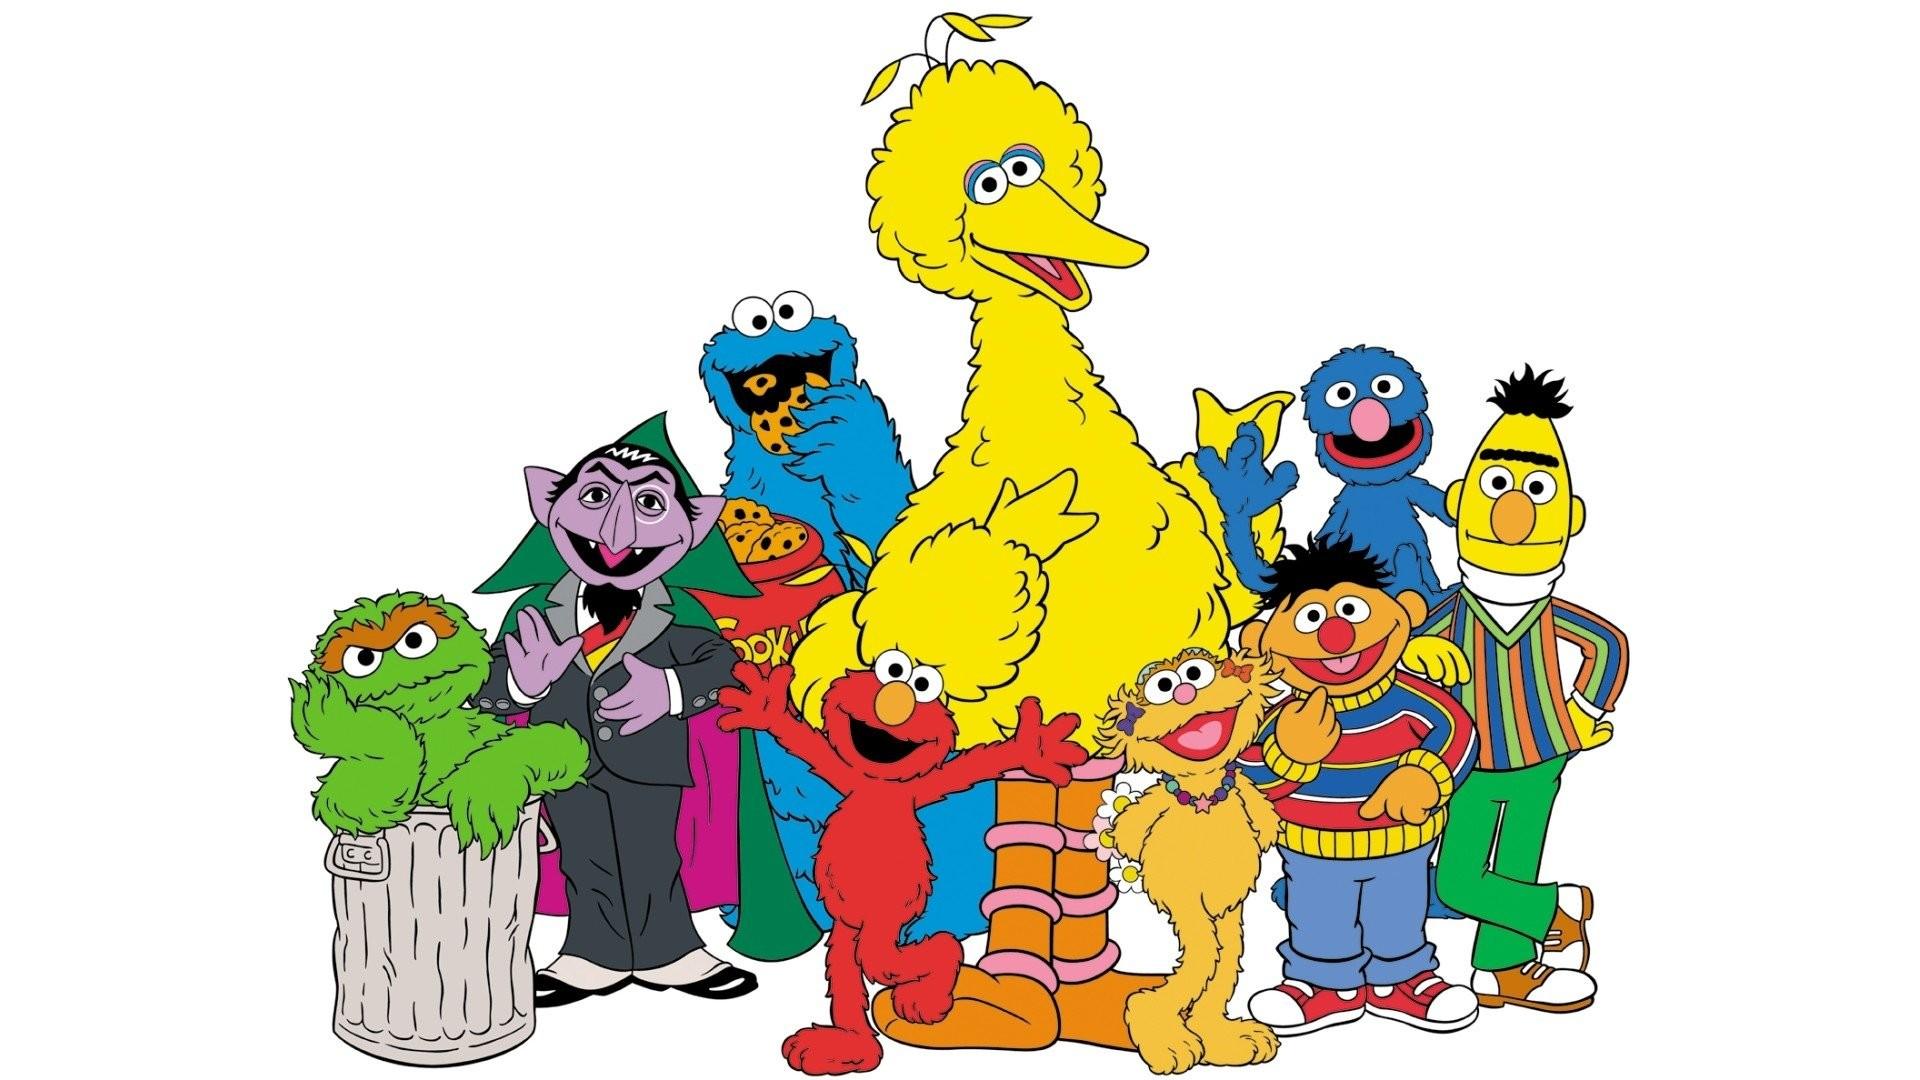 Res: 1920x1080, TV Show - Sesame Street Big Bird Bert (Sesame Street) Ernie (Sesame Street